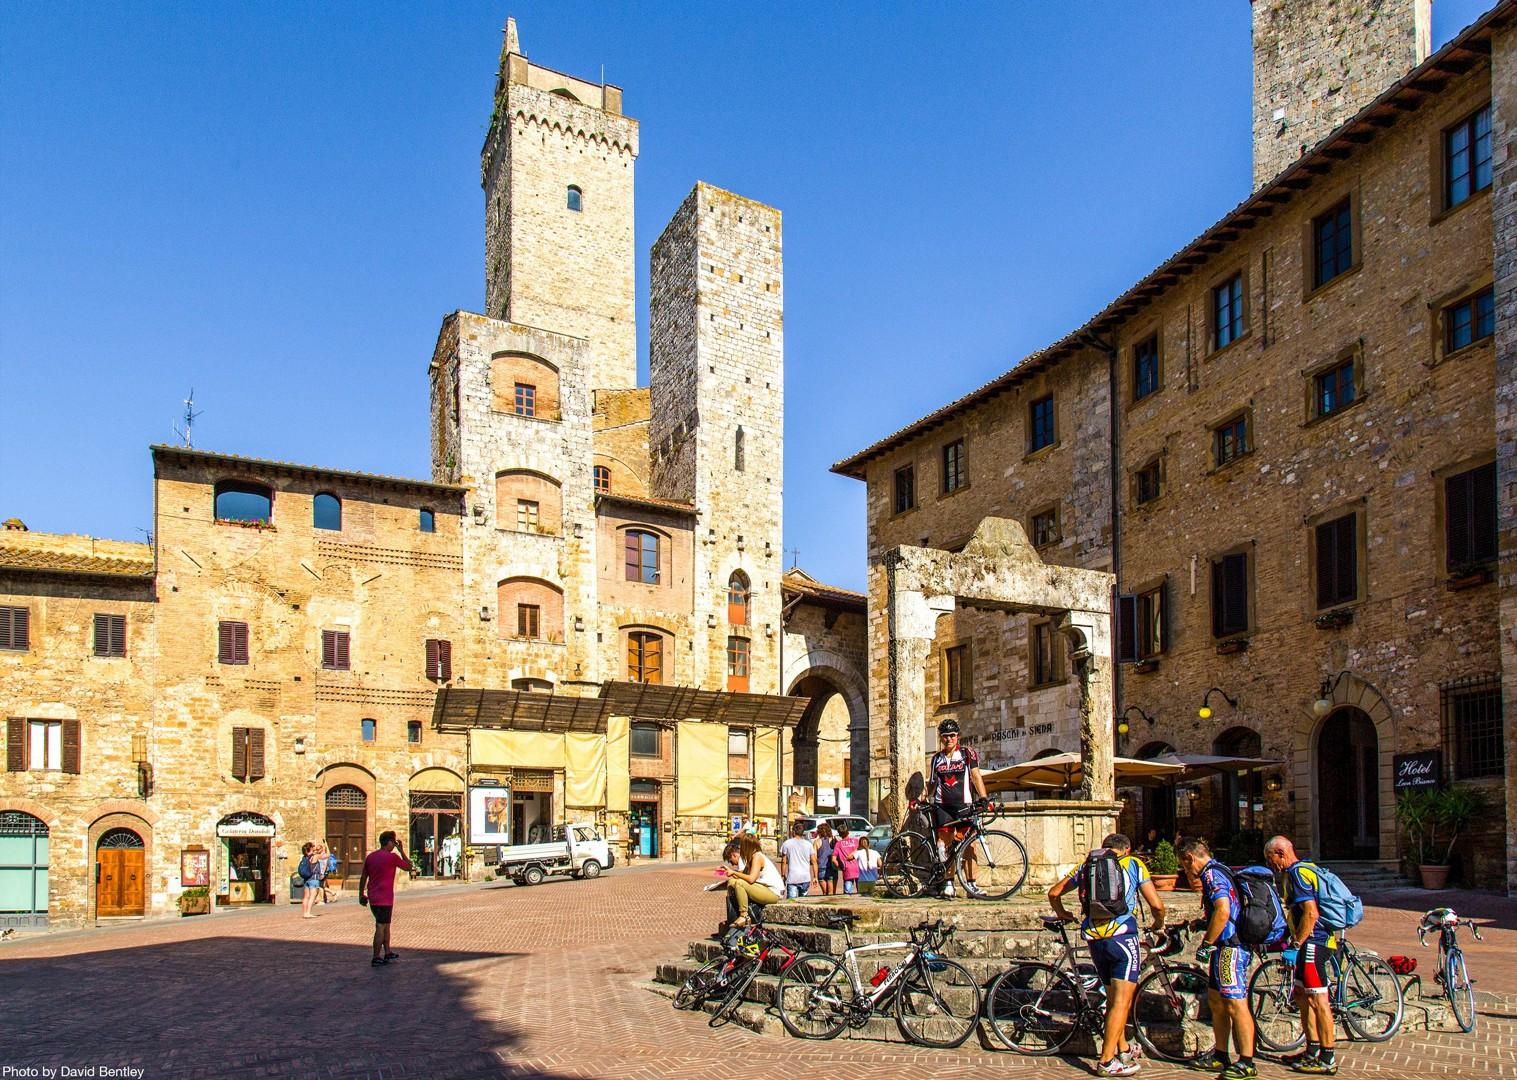 0049 Day 3 Tuscany Square.jpg - Italy - Tuscany - Giro della Toscana - Self-Guided Road Cycling Holiday - Road Cycling